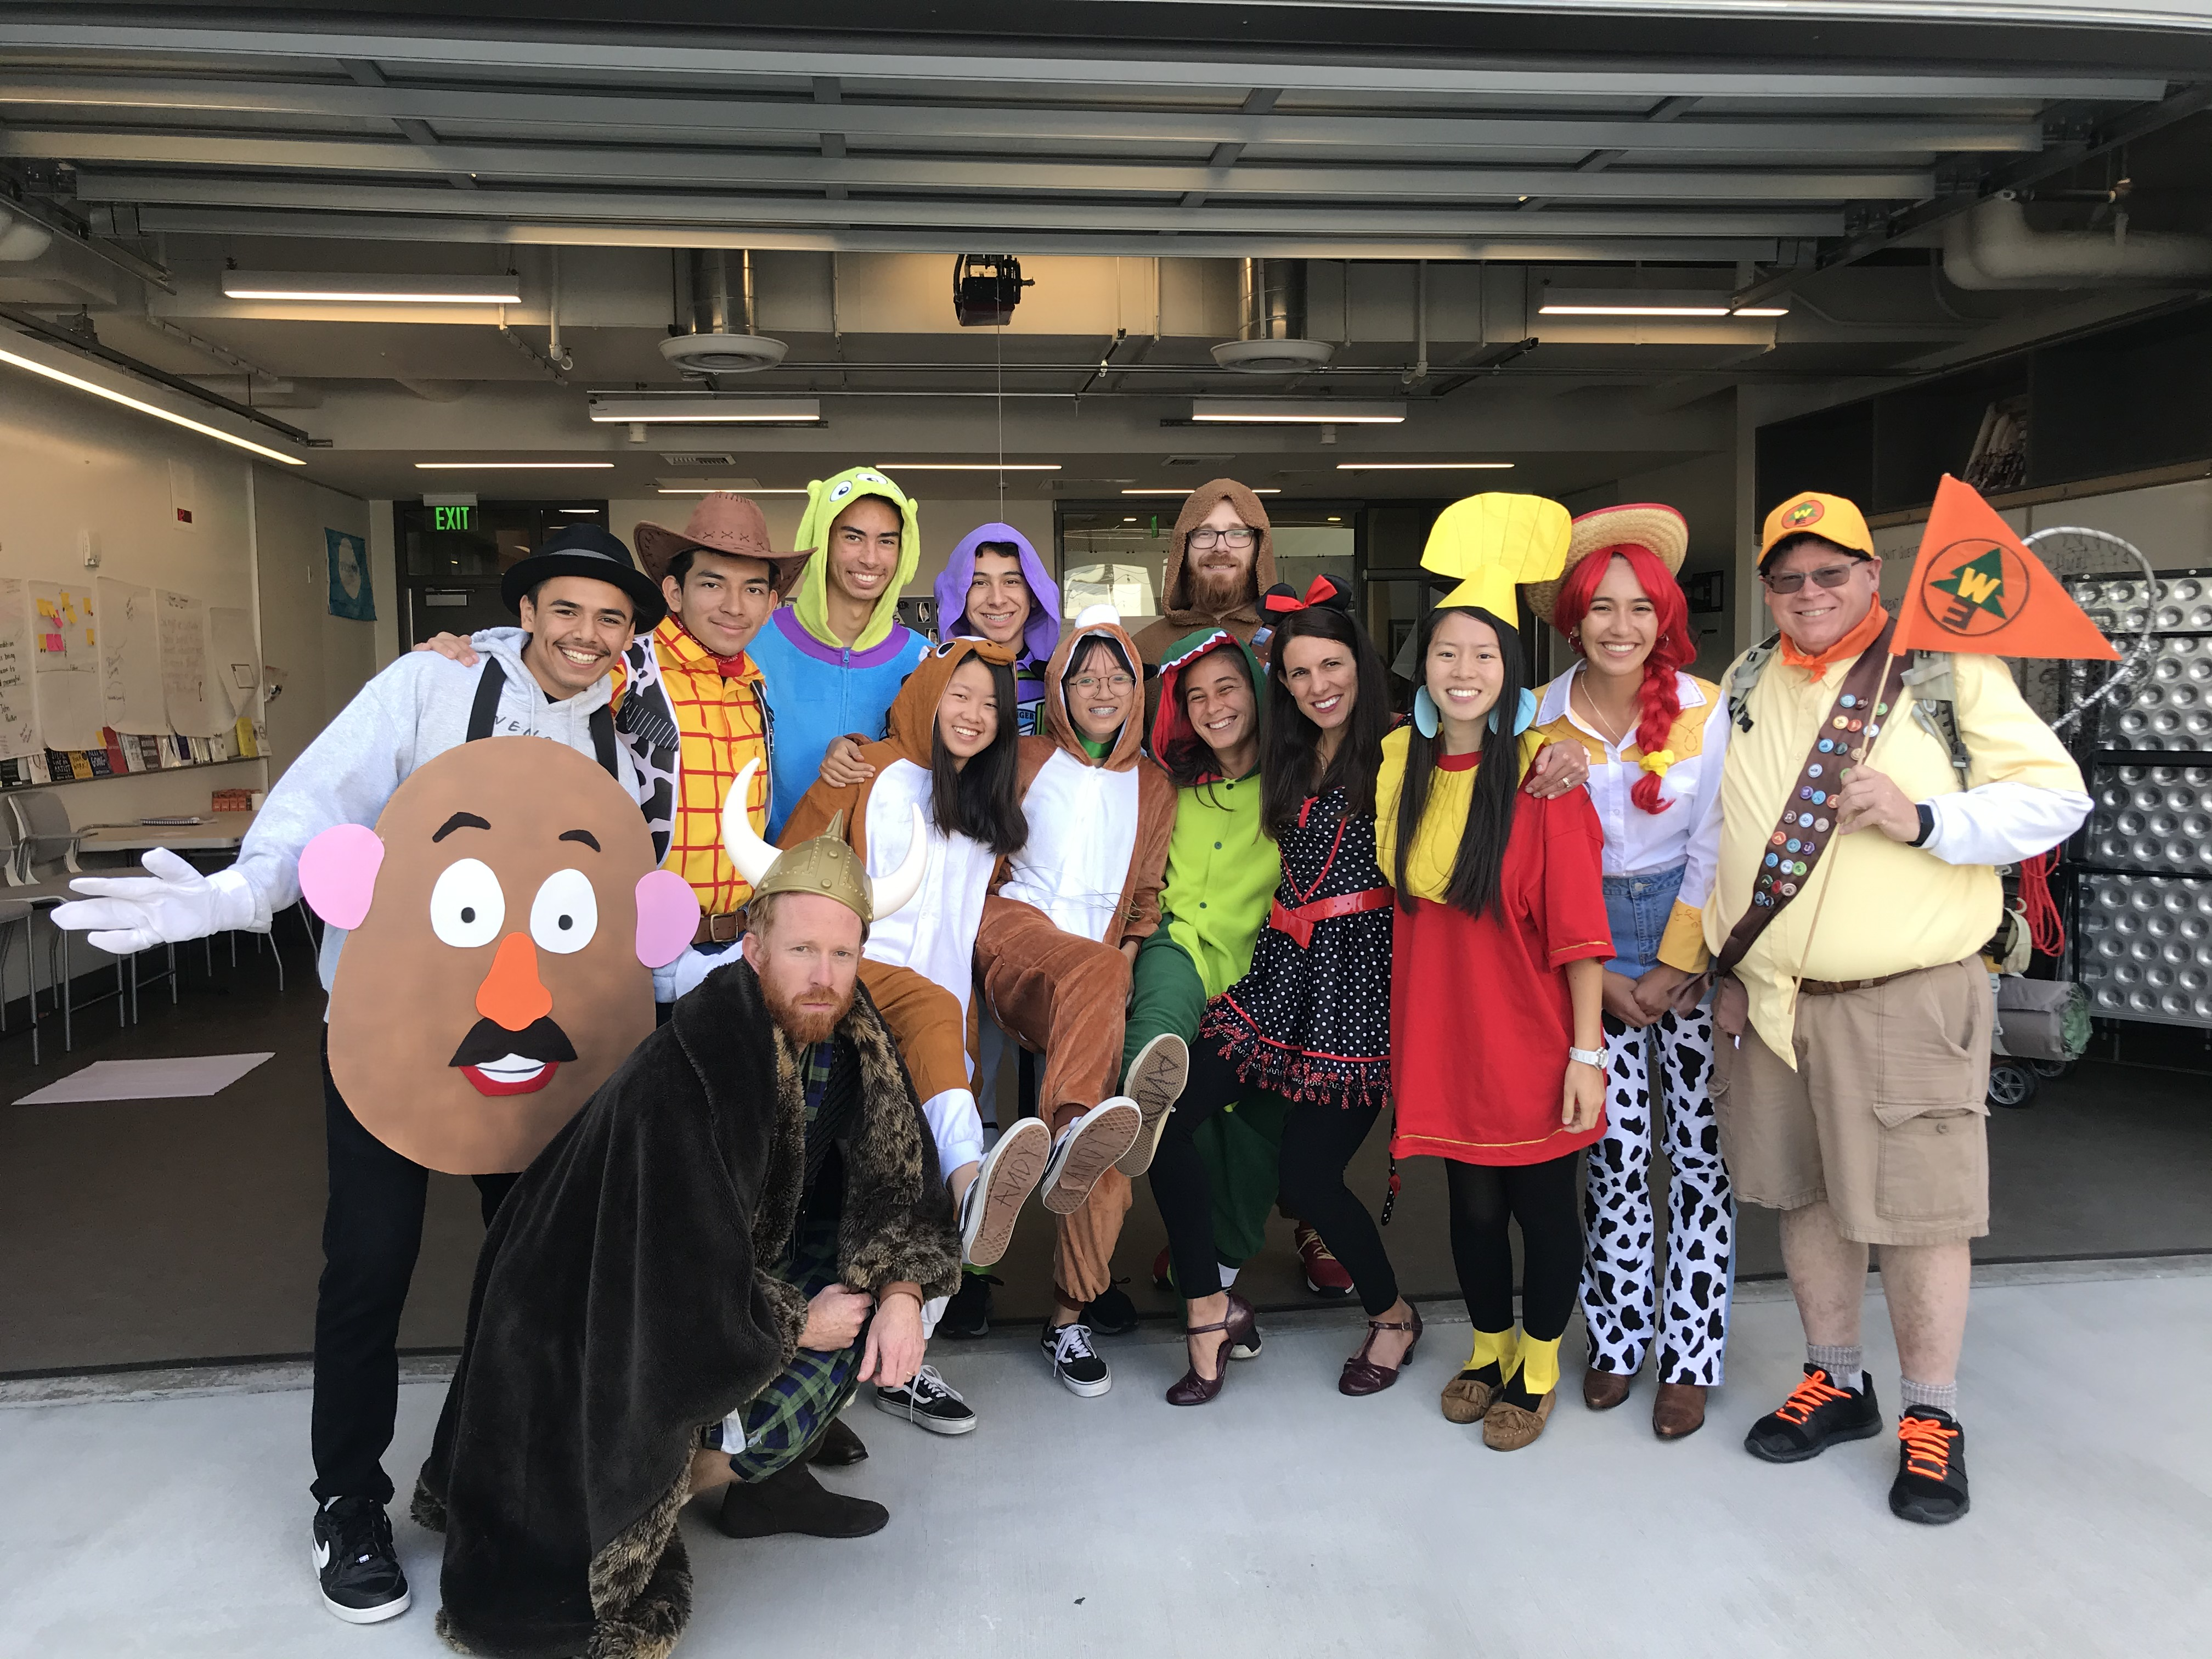 Team 11 Halloween